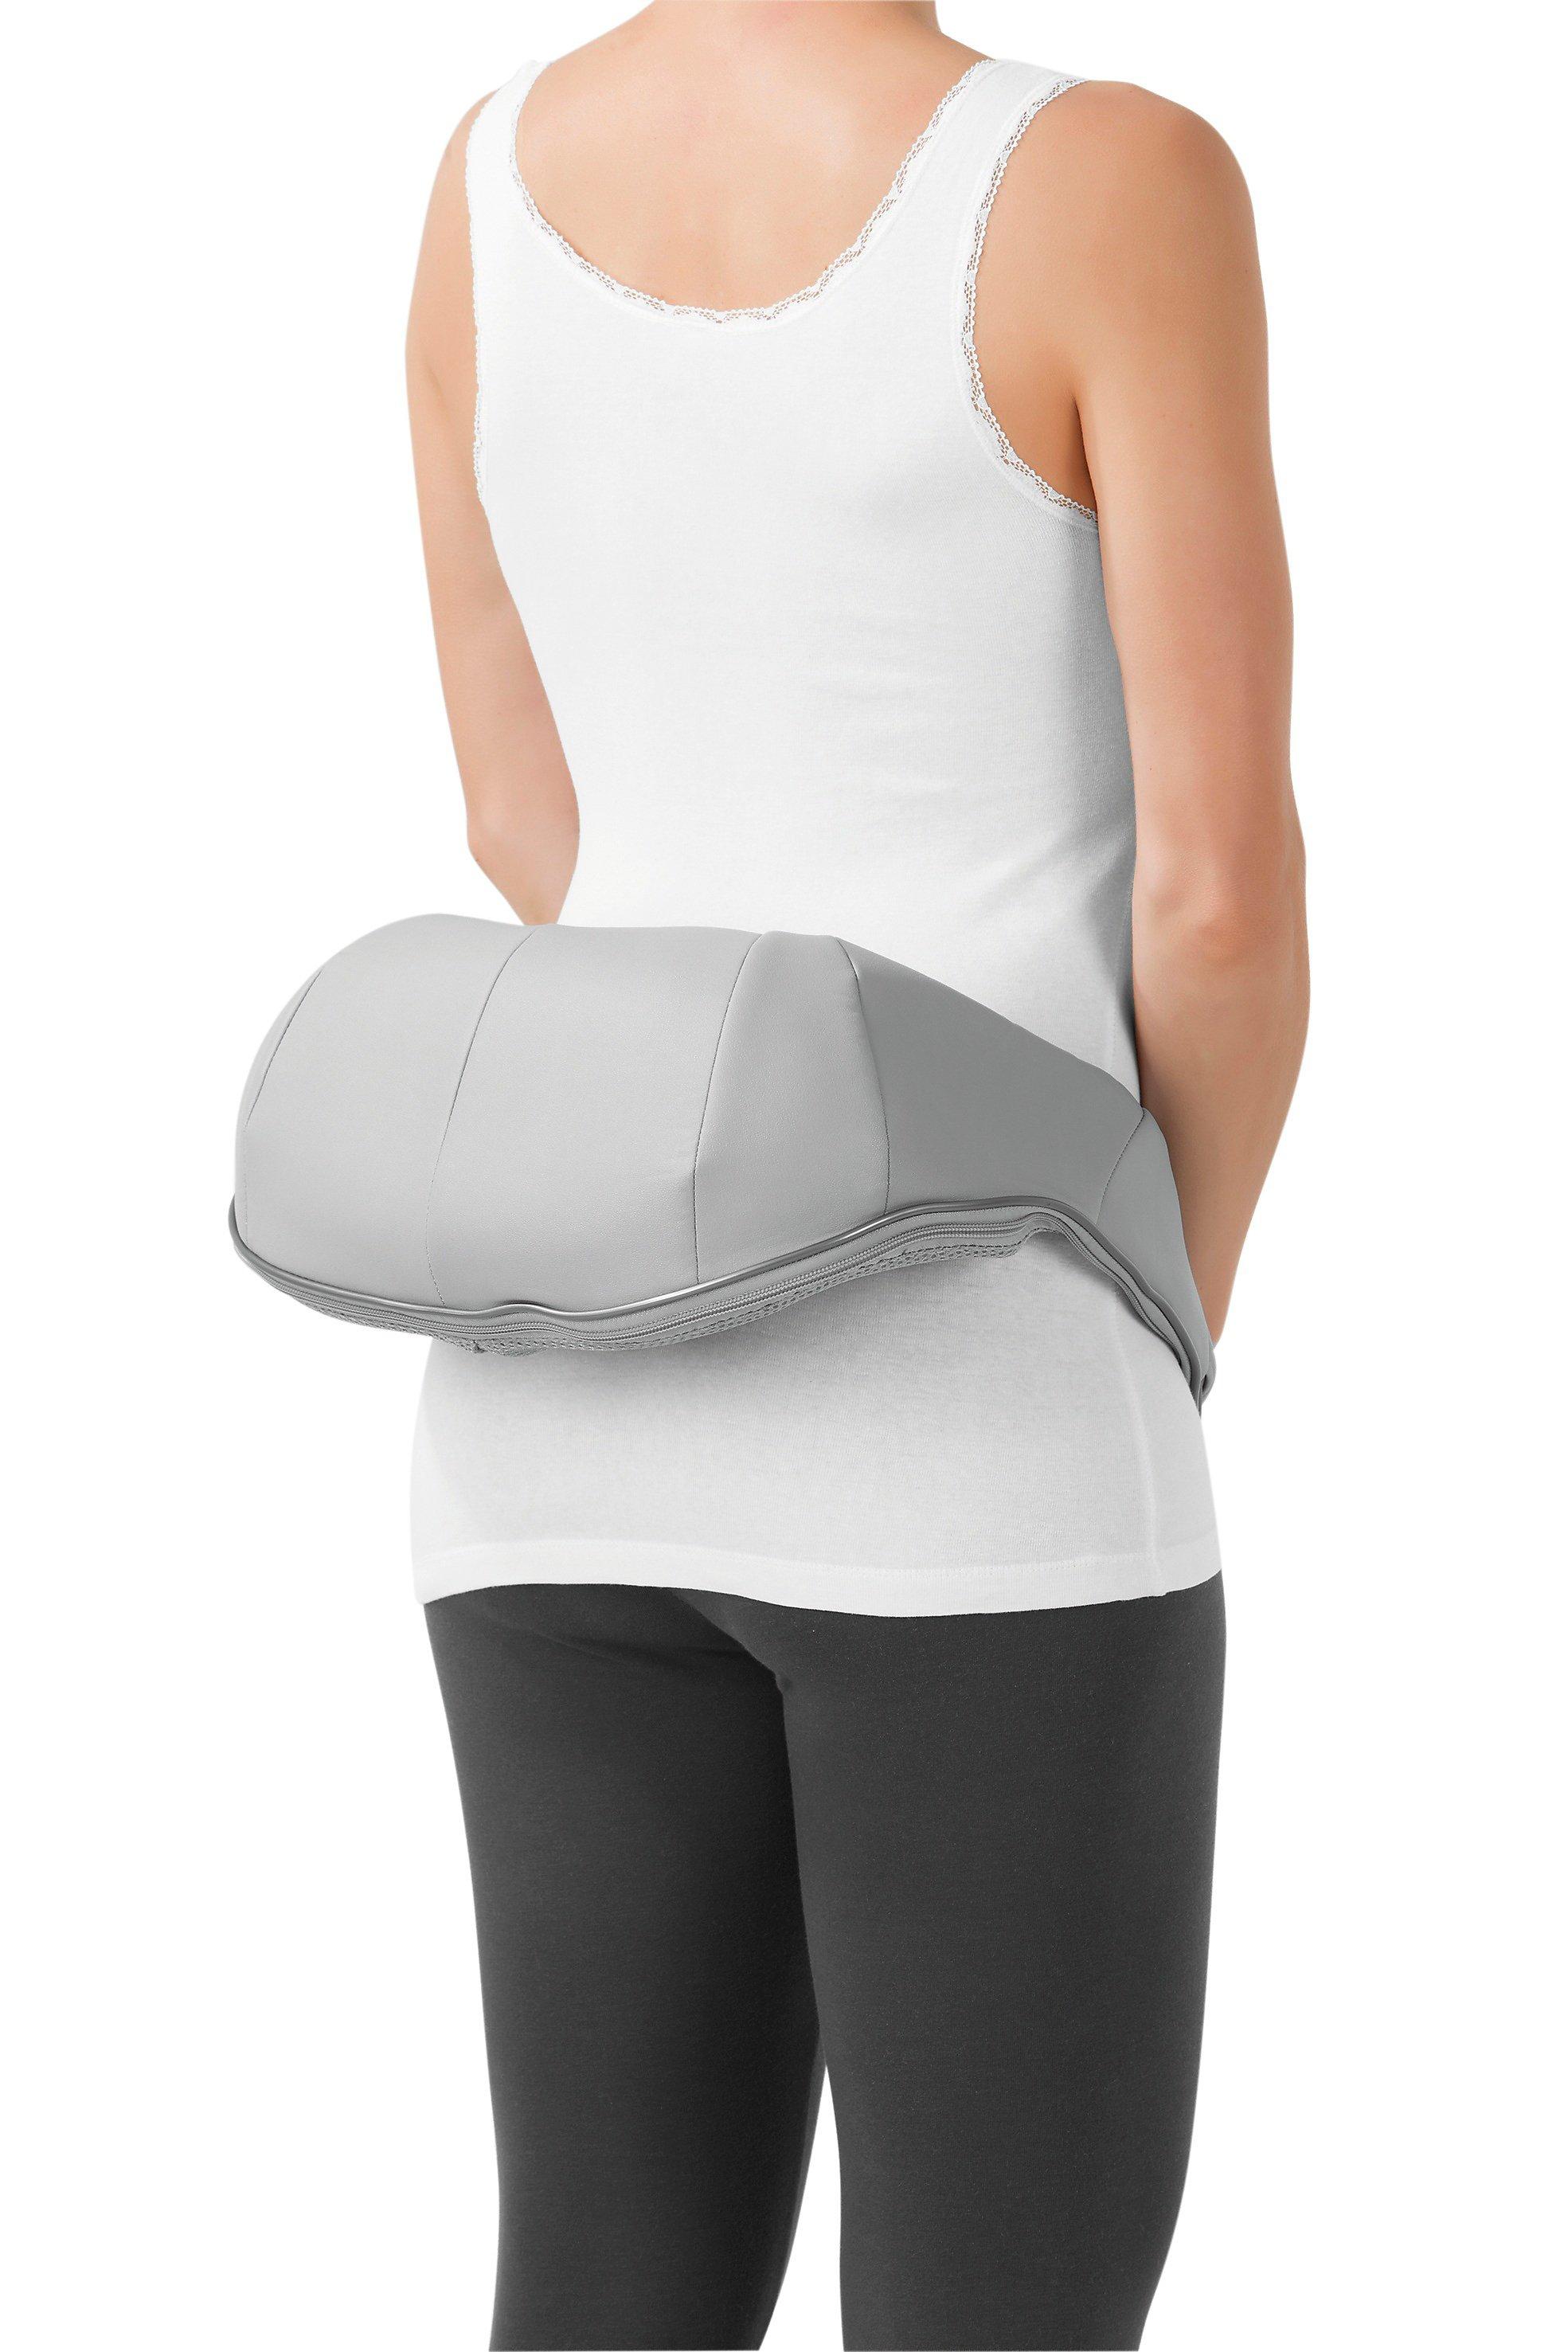 Vitalmaxx Shiatsu Massagegerät Für Nacken Schultern Weltbildde